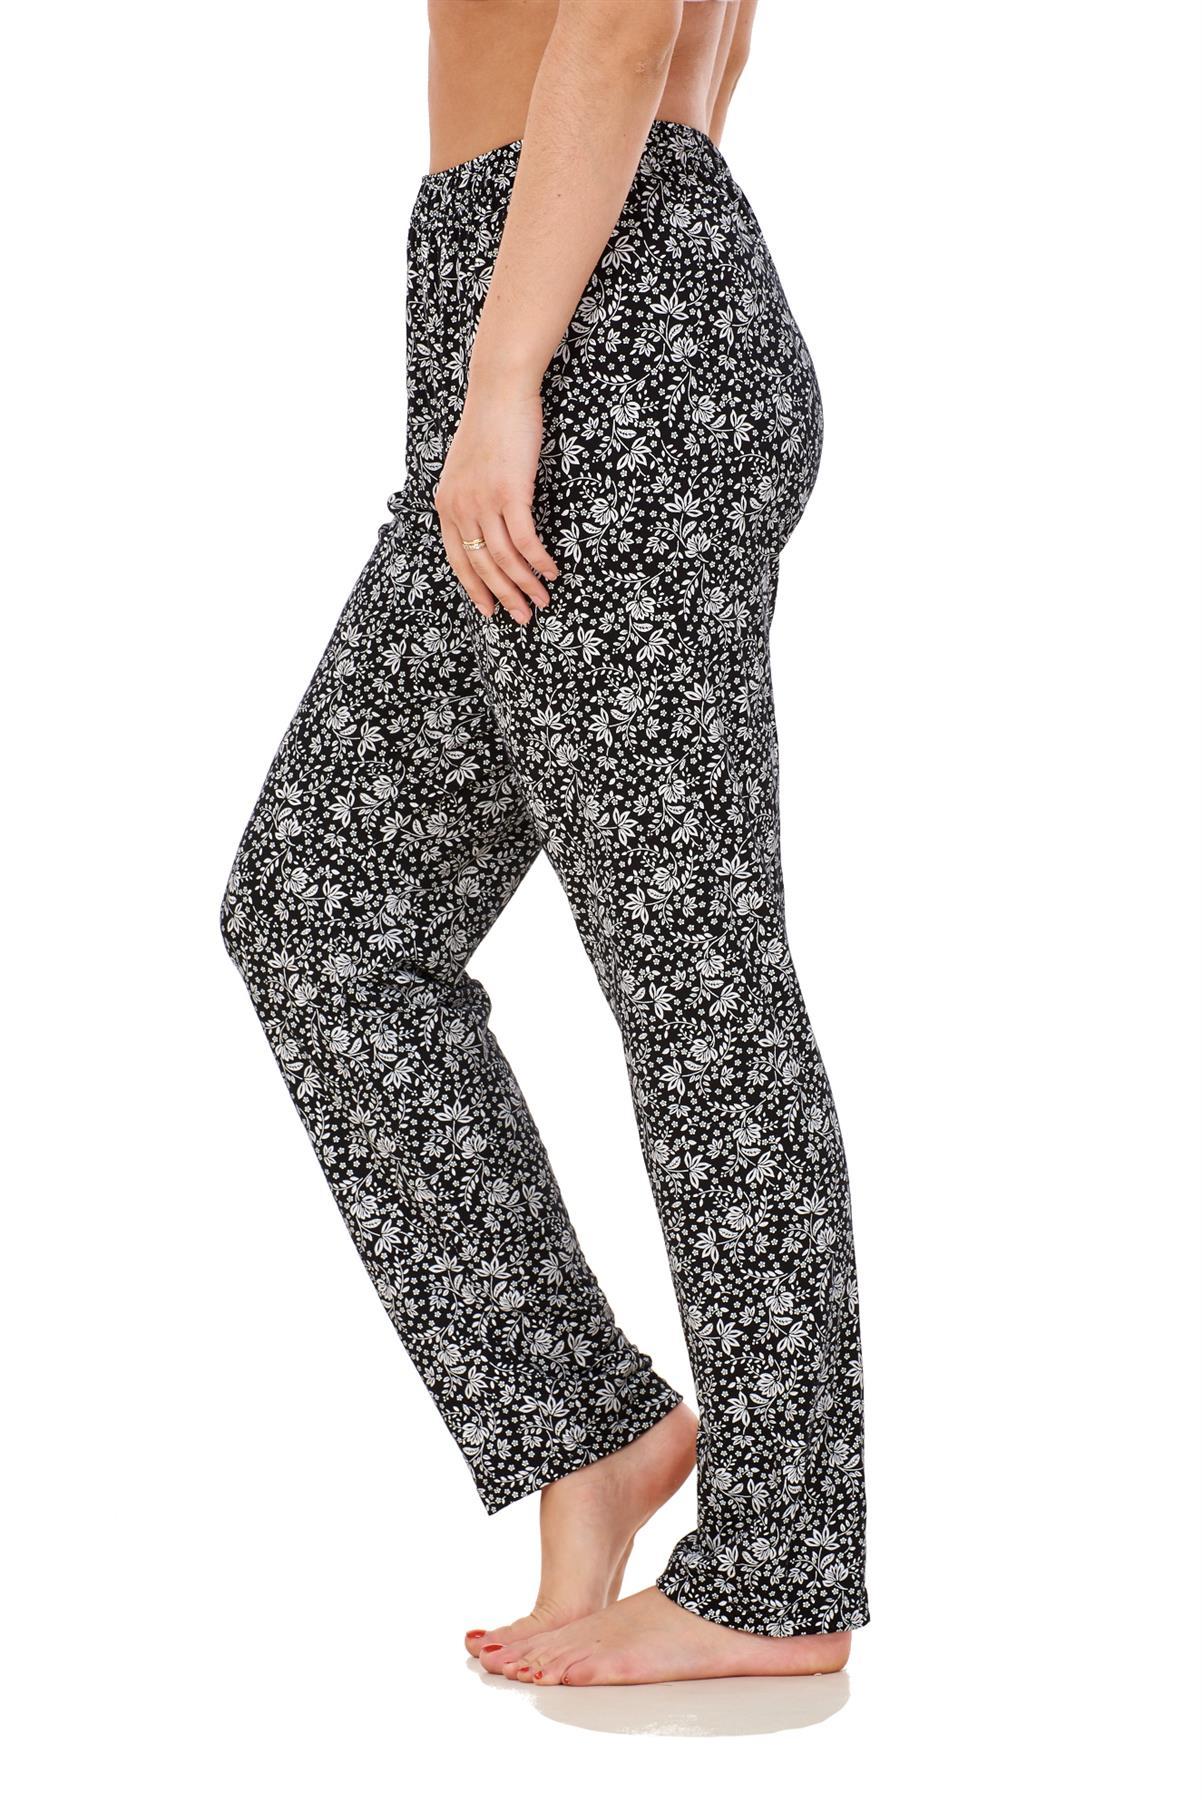 Ladies-Women-Trouser-Elasticated-Printed-Tapered-Harem-High-waist-Regular-Pants thumbnail 19